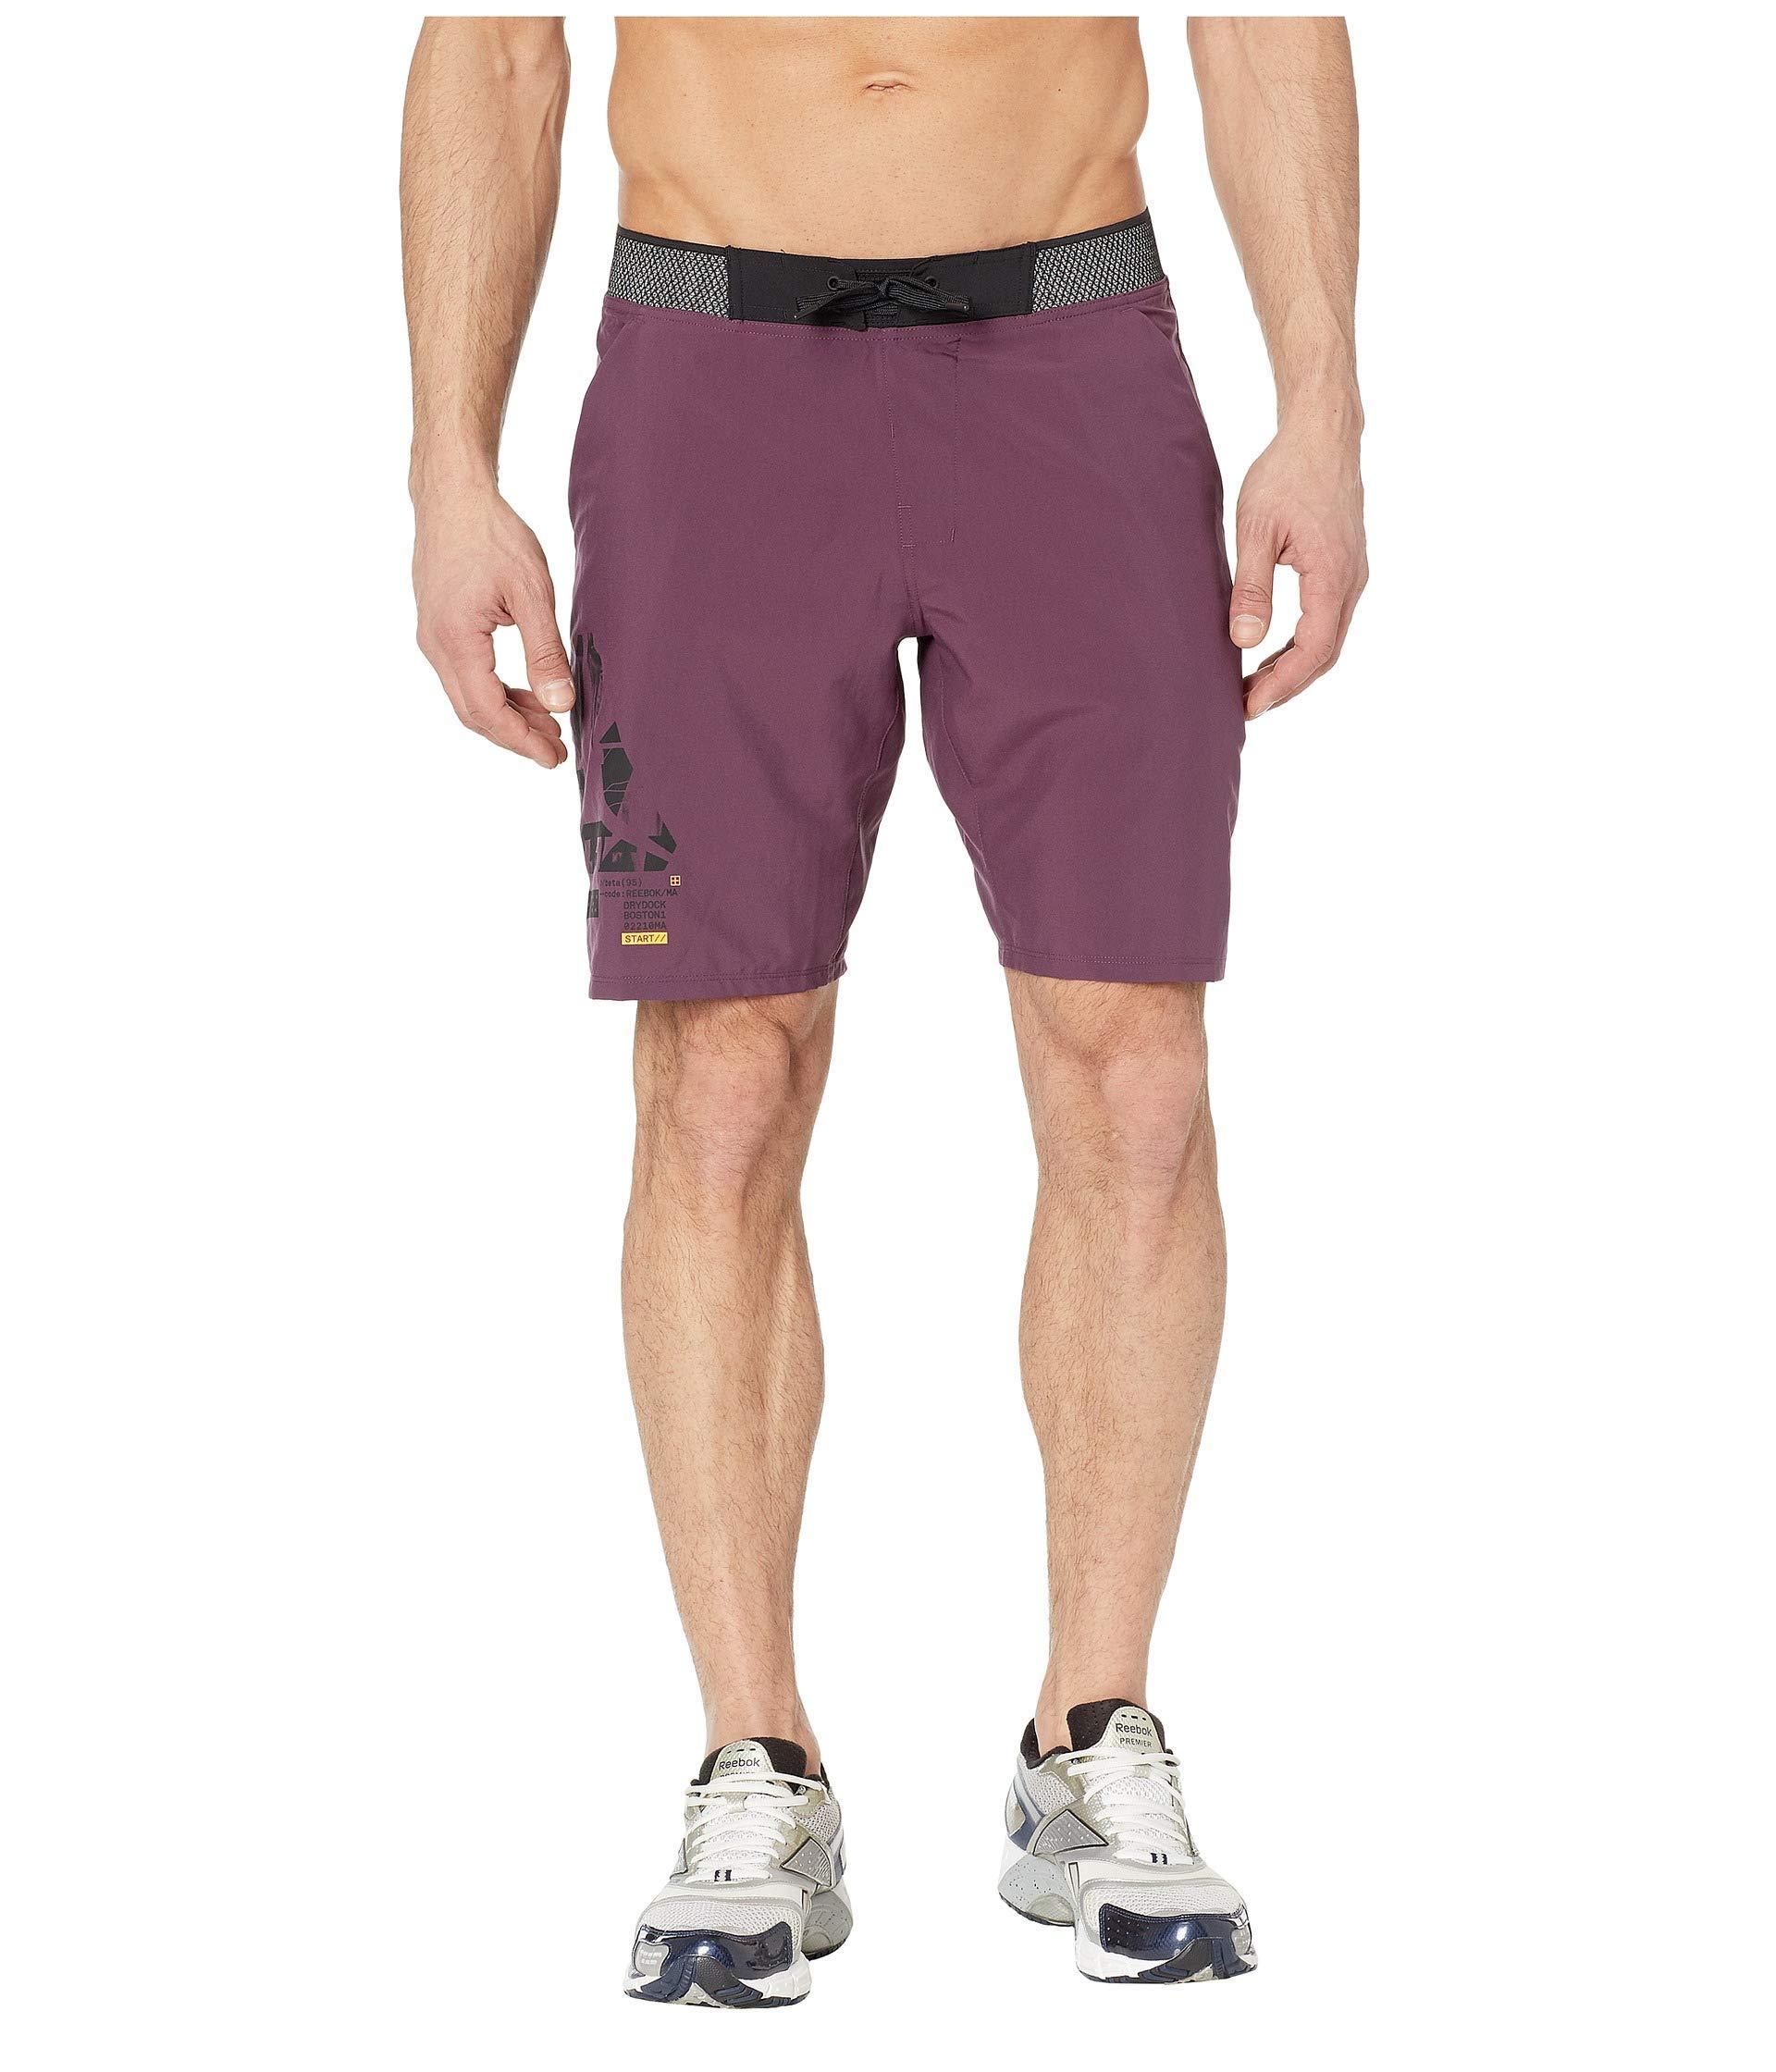 aeddae7a3e9c Reebok - Purple Epic Lightweight Shorts for Men - Lyst. View fullscreen